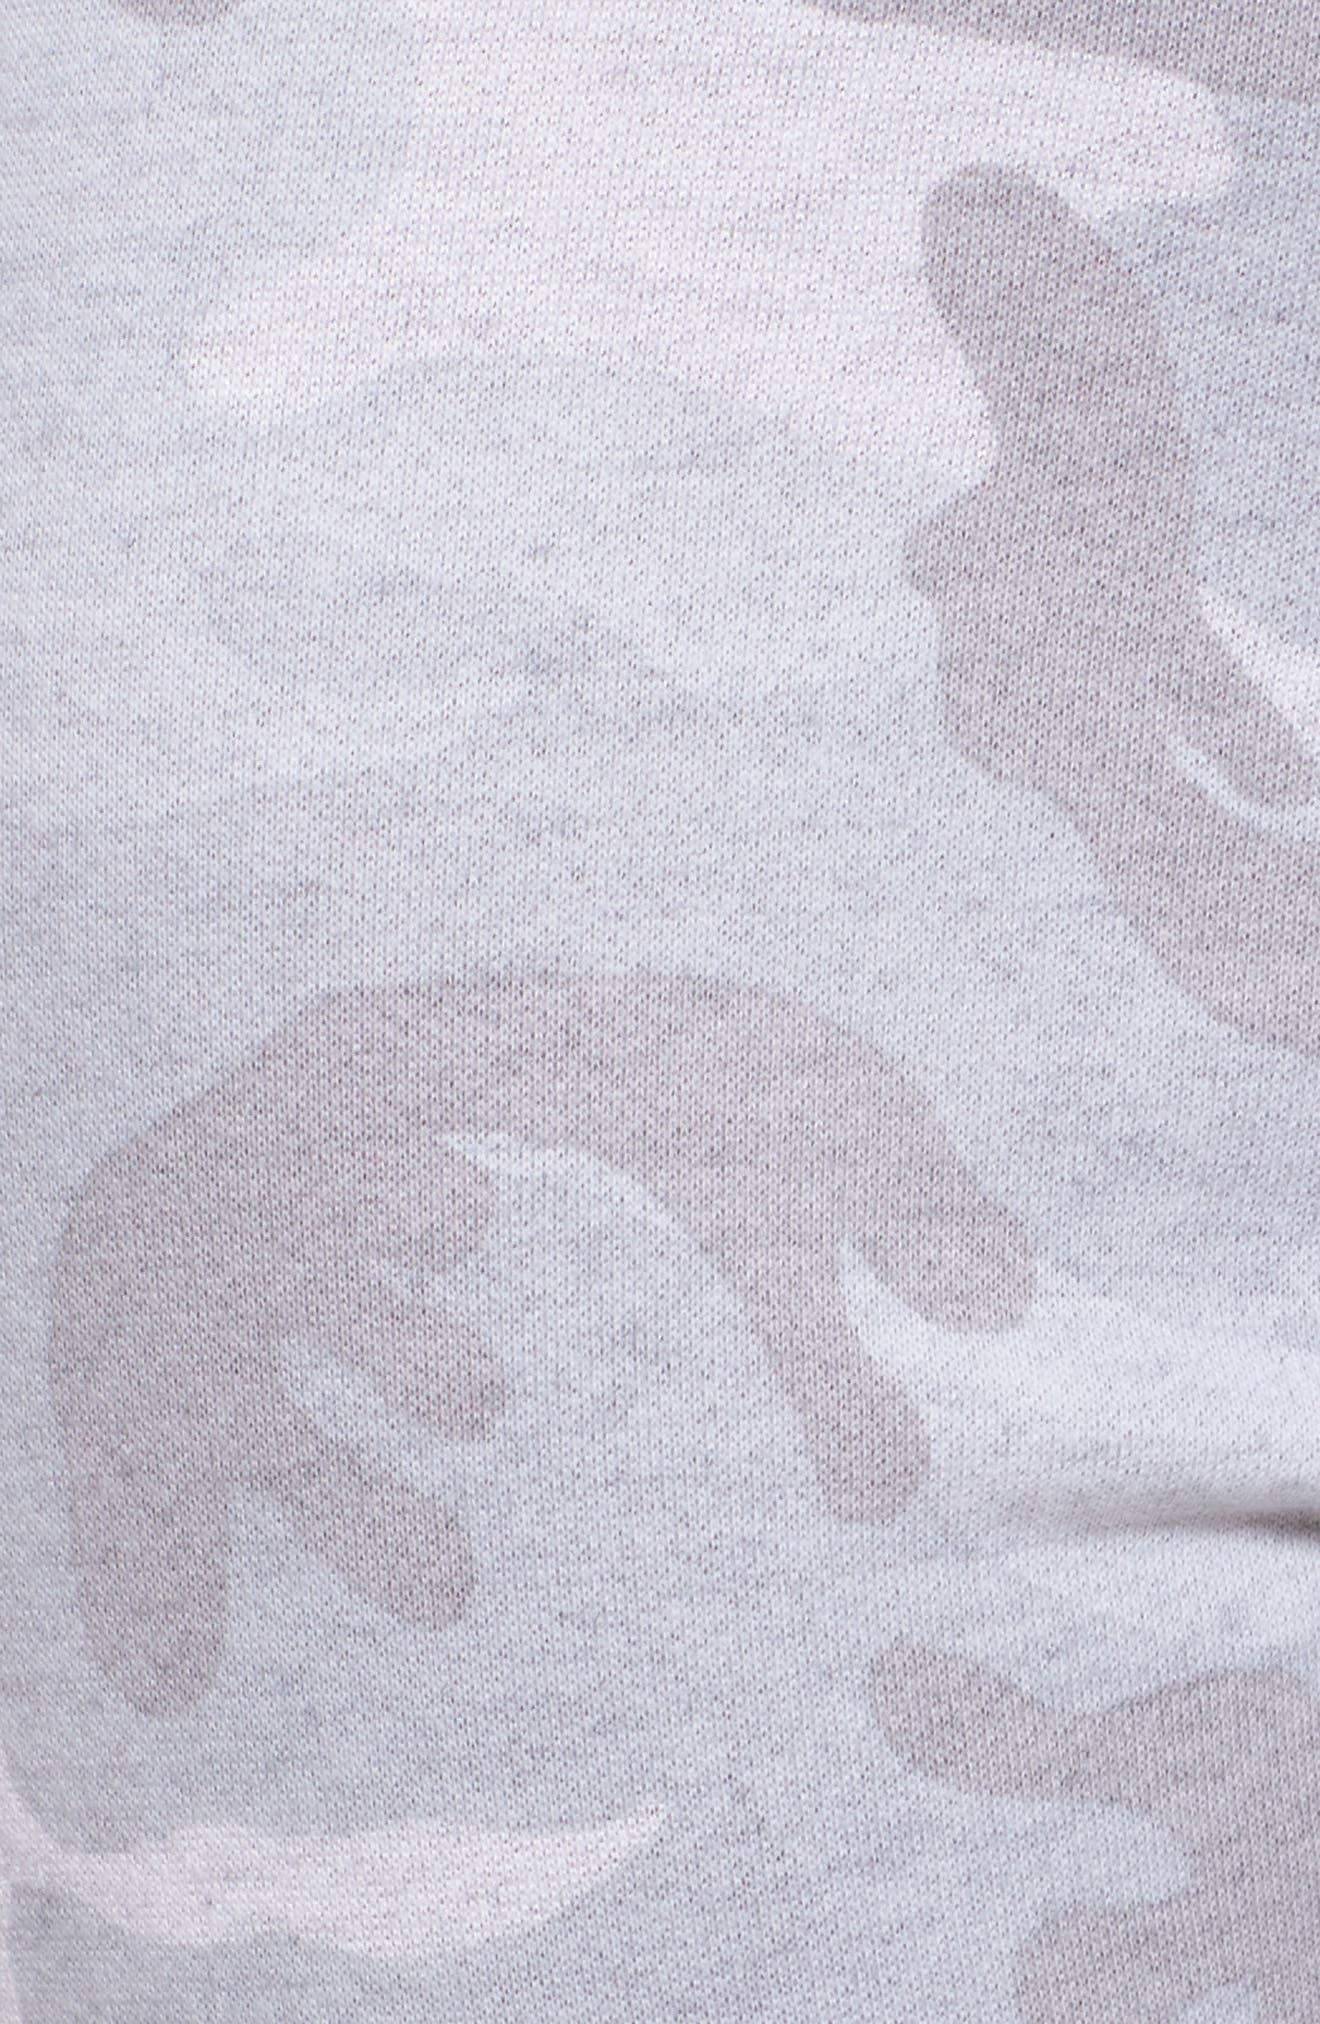 Campbell Vintage Jogger Pants,                             Alternate thumbnail 5, color,                             093